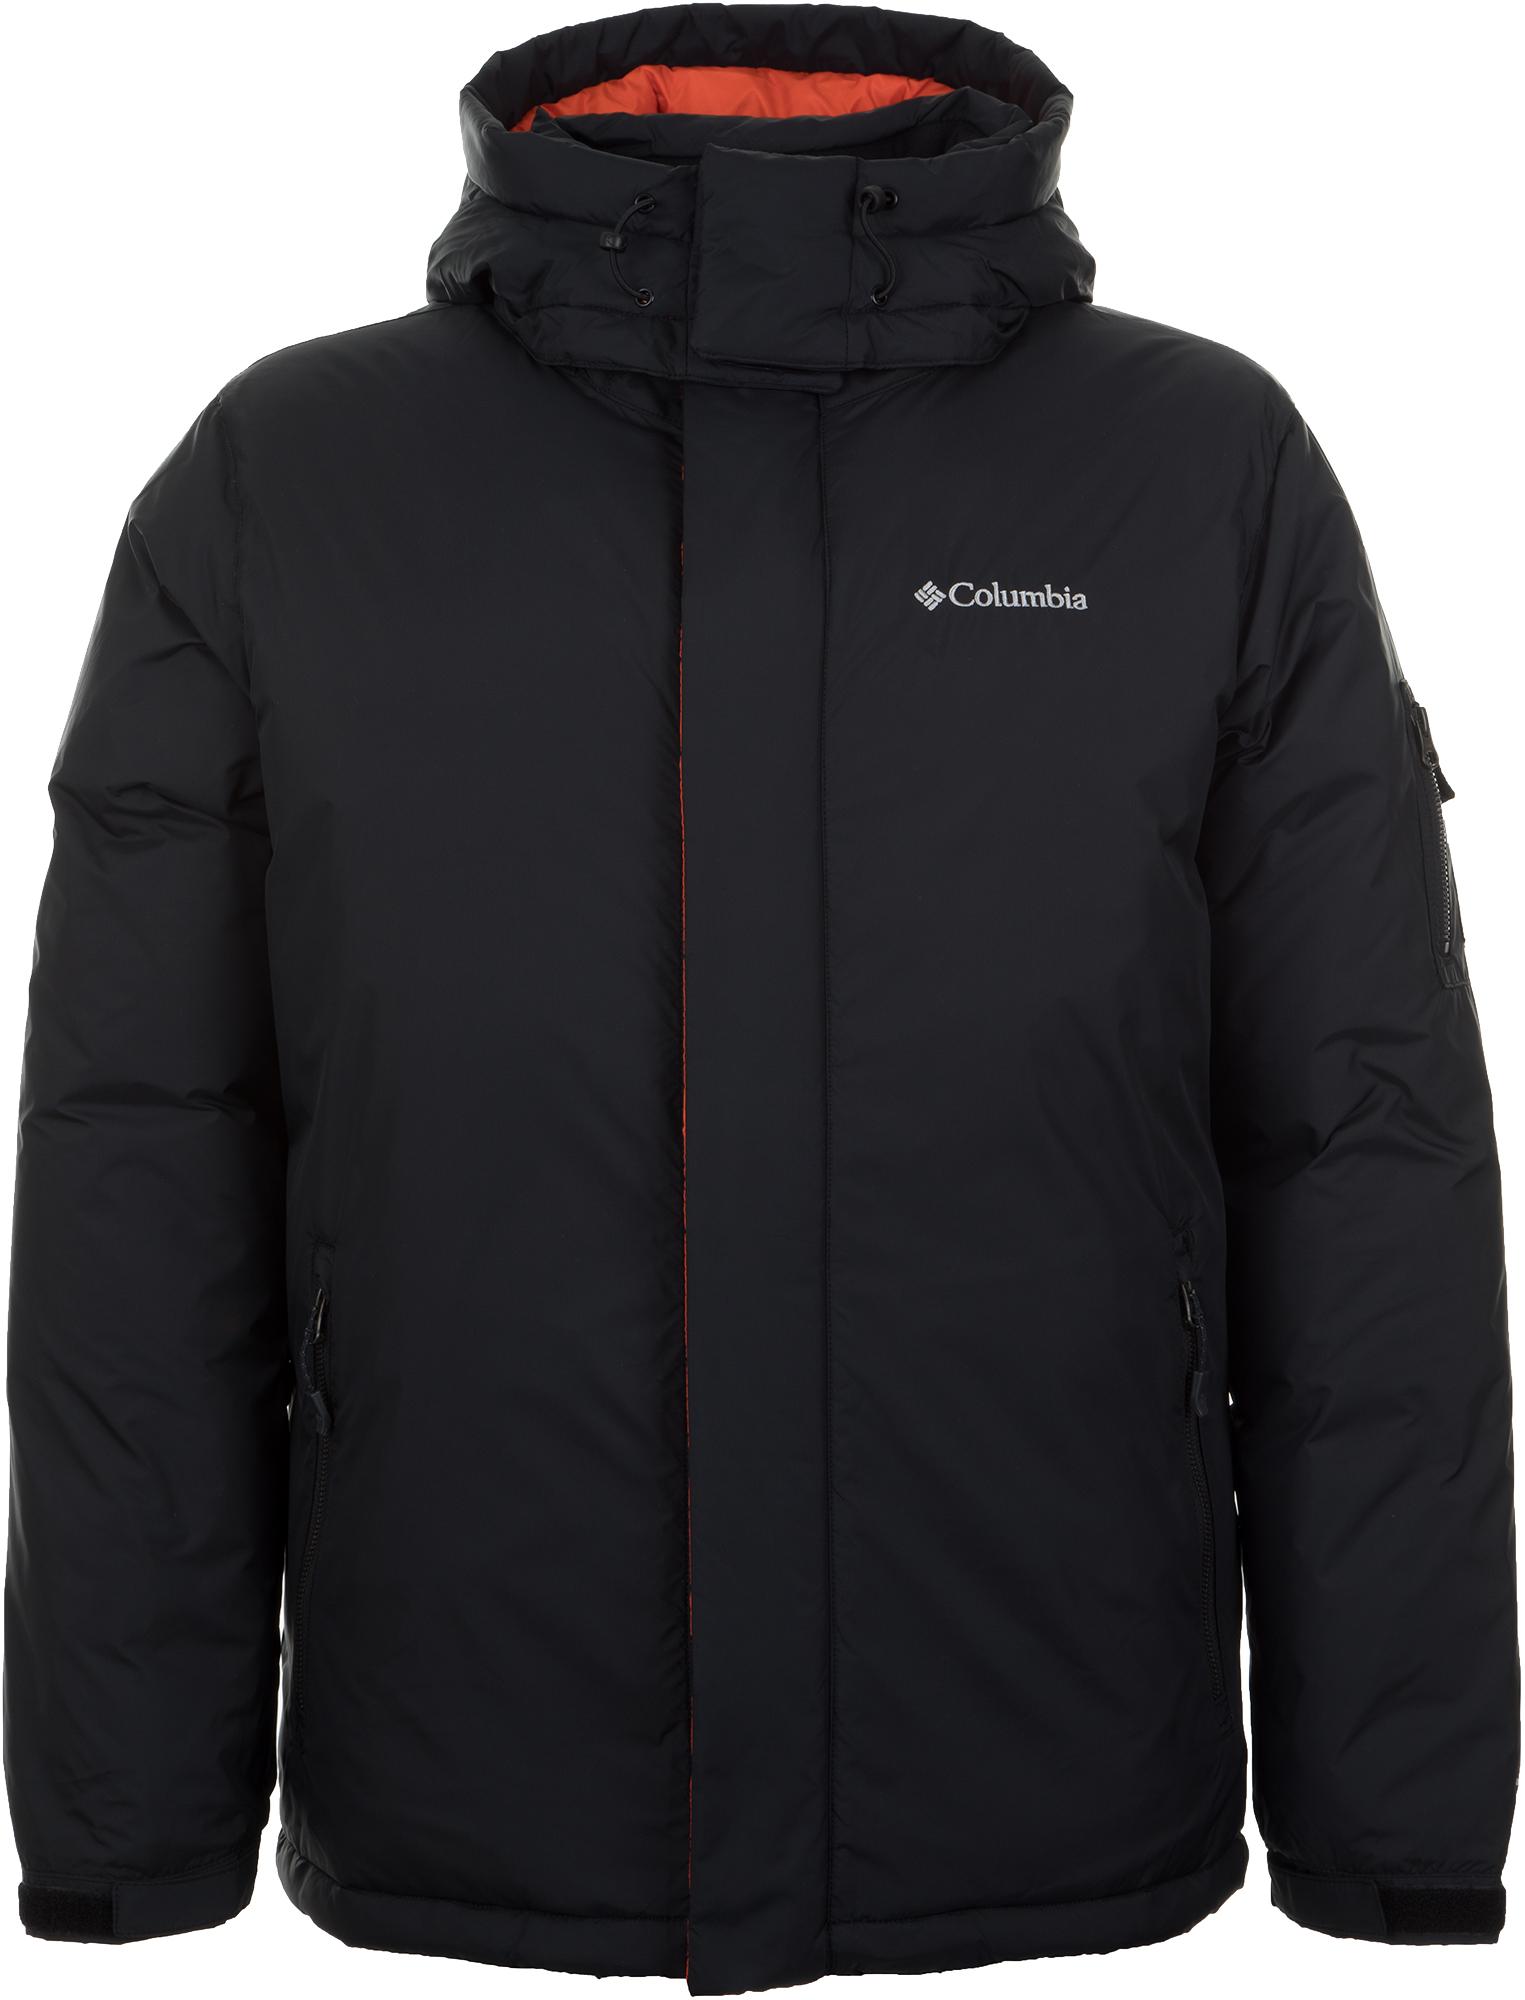 Columbia Куртка пуховая мужская Columbia Wildhorse Crest, размер 56-58 crest 200g